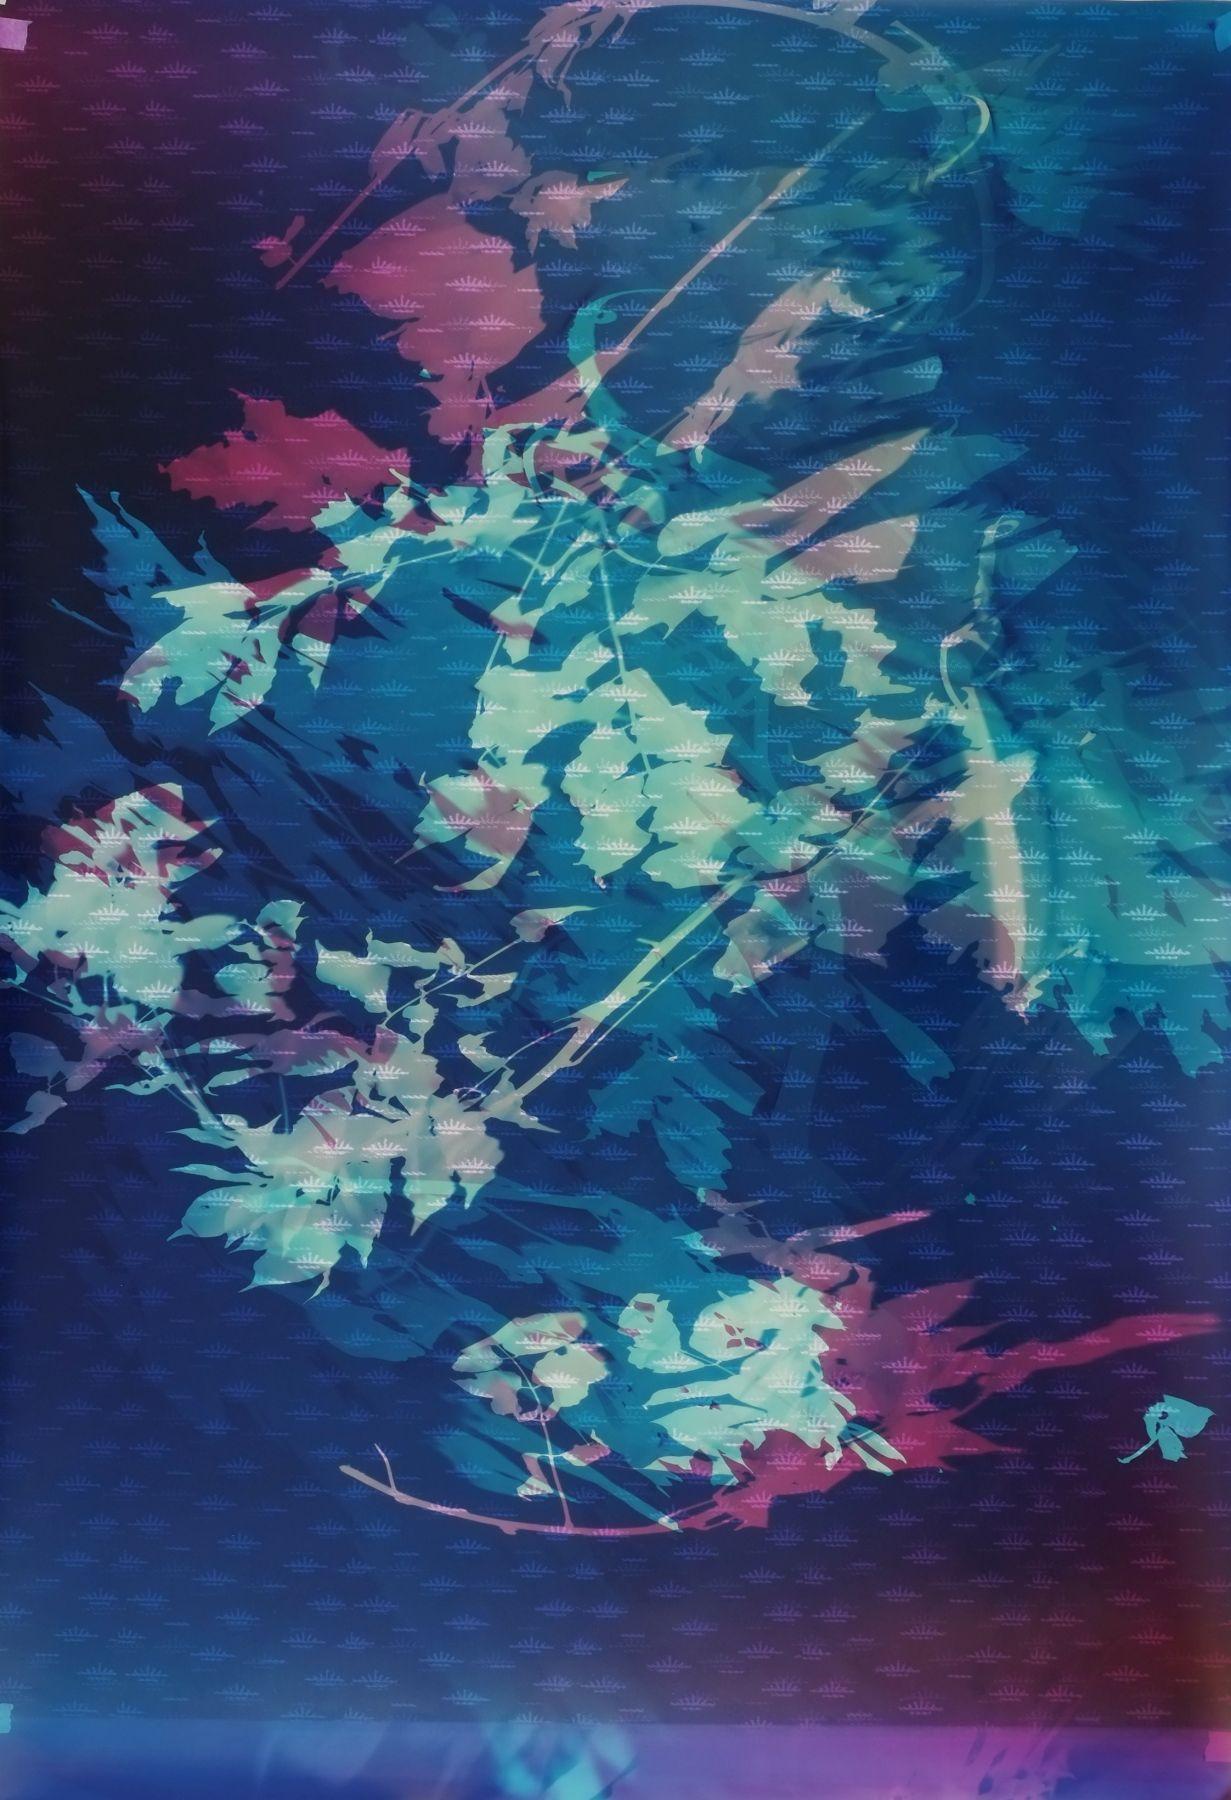 Field Recording (Swamp Submersion I),2016, 60 x 40 inch unique chromogenic print